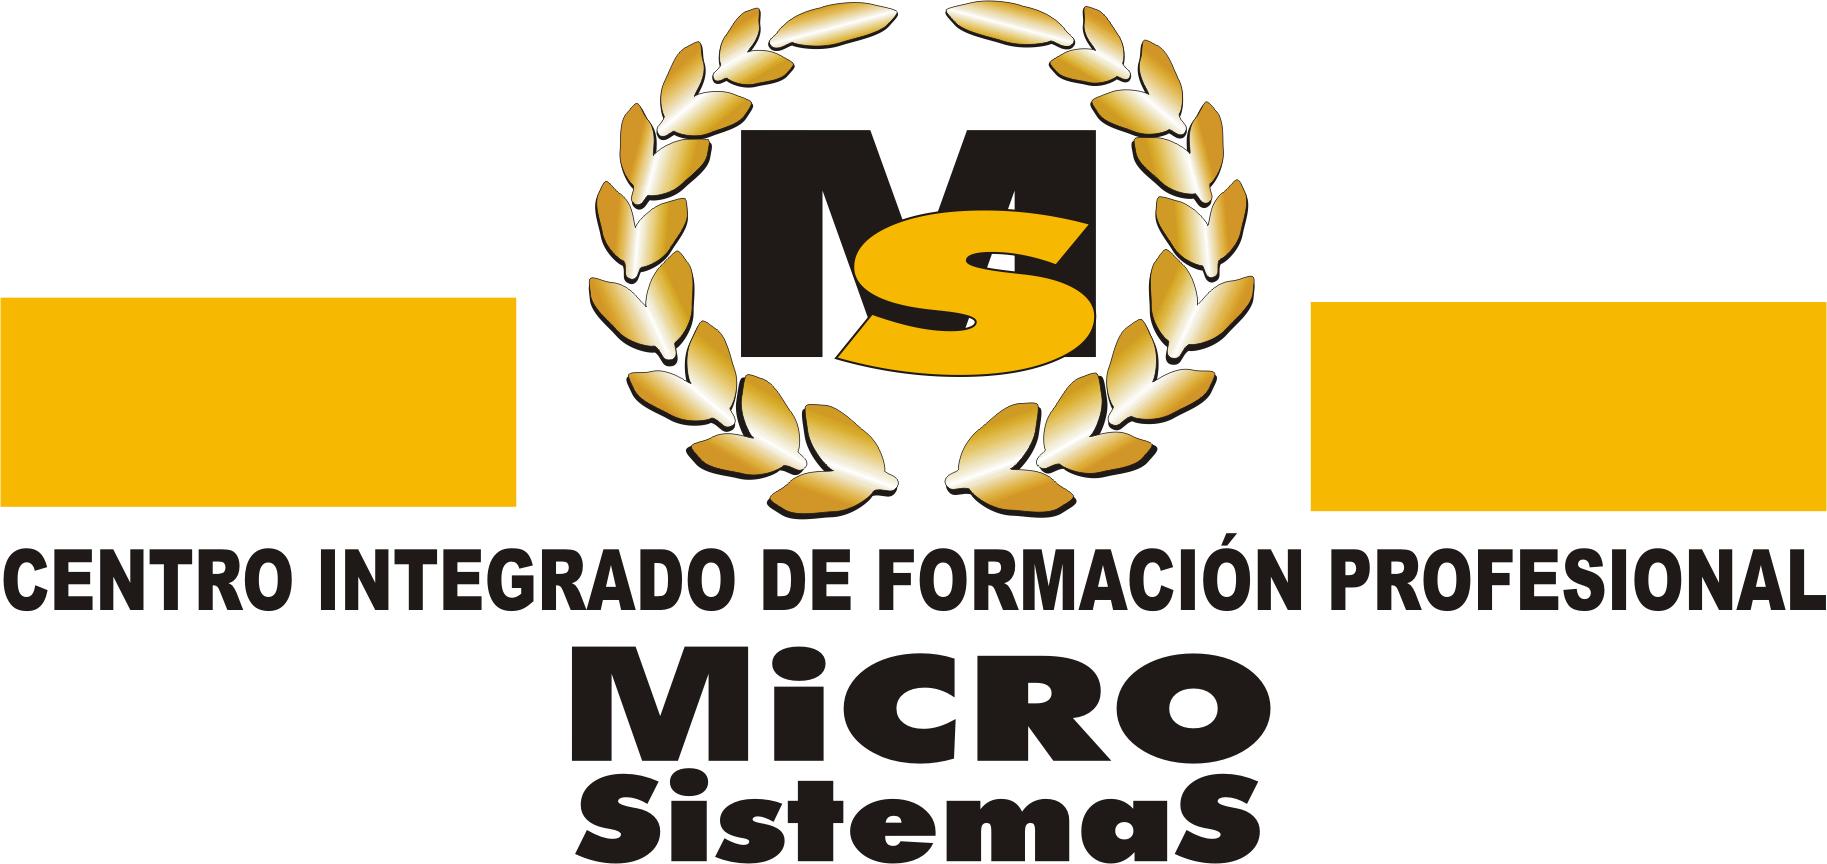 Microsistemas Lanzarote